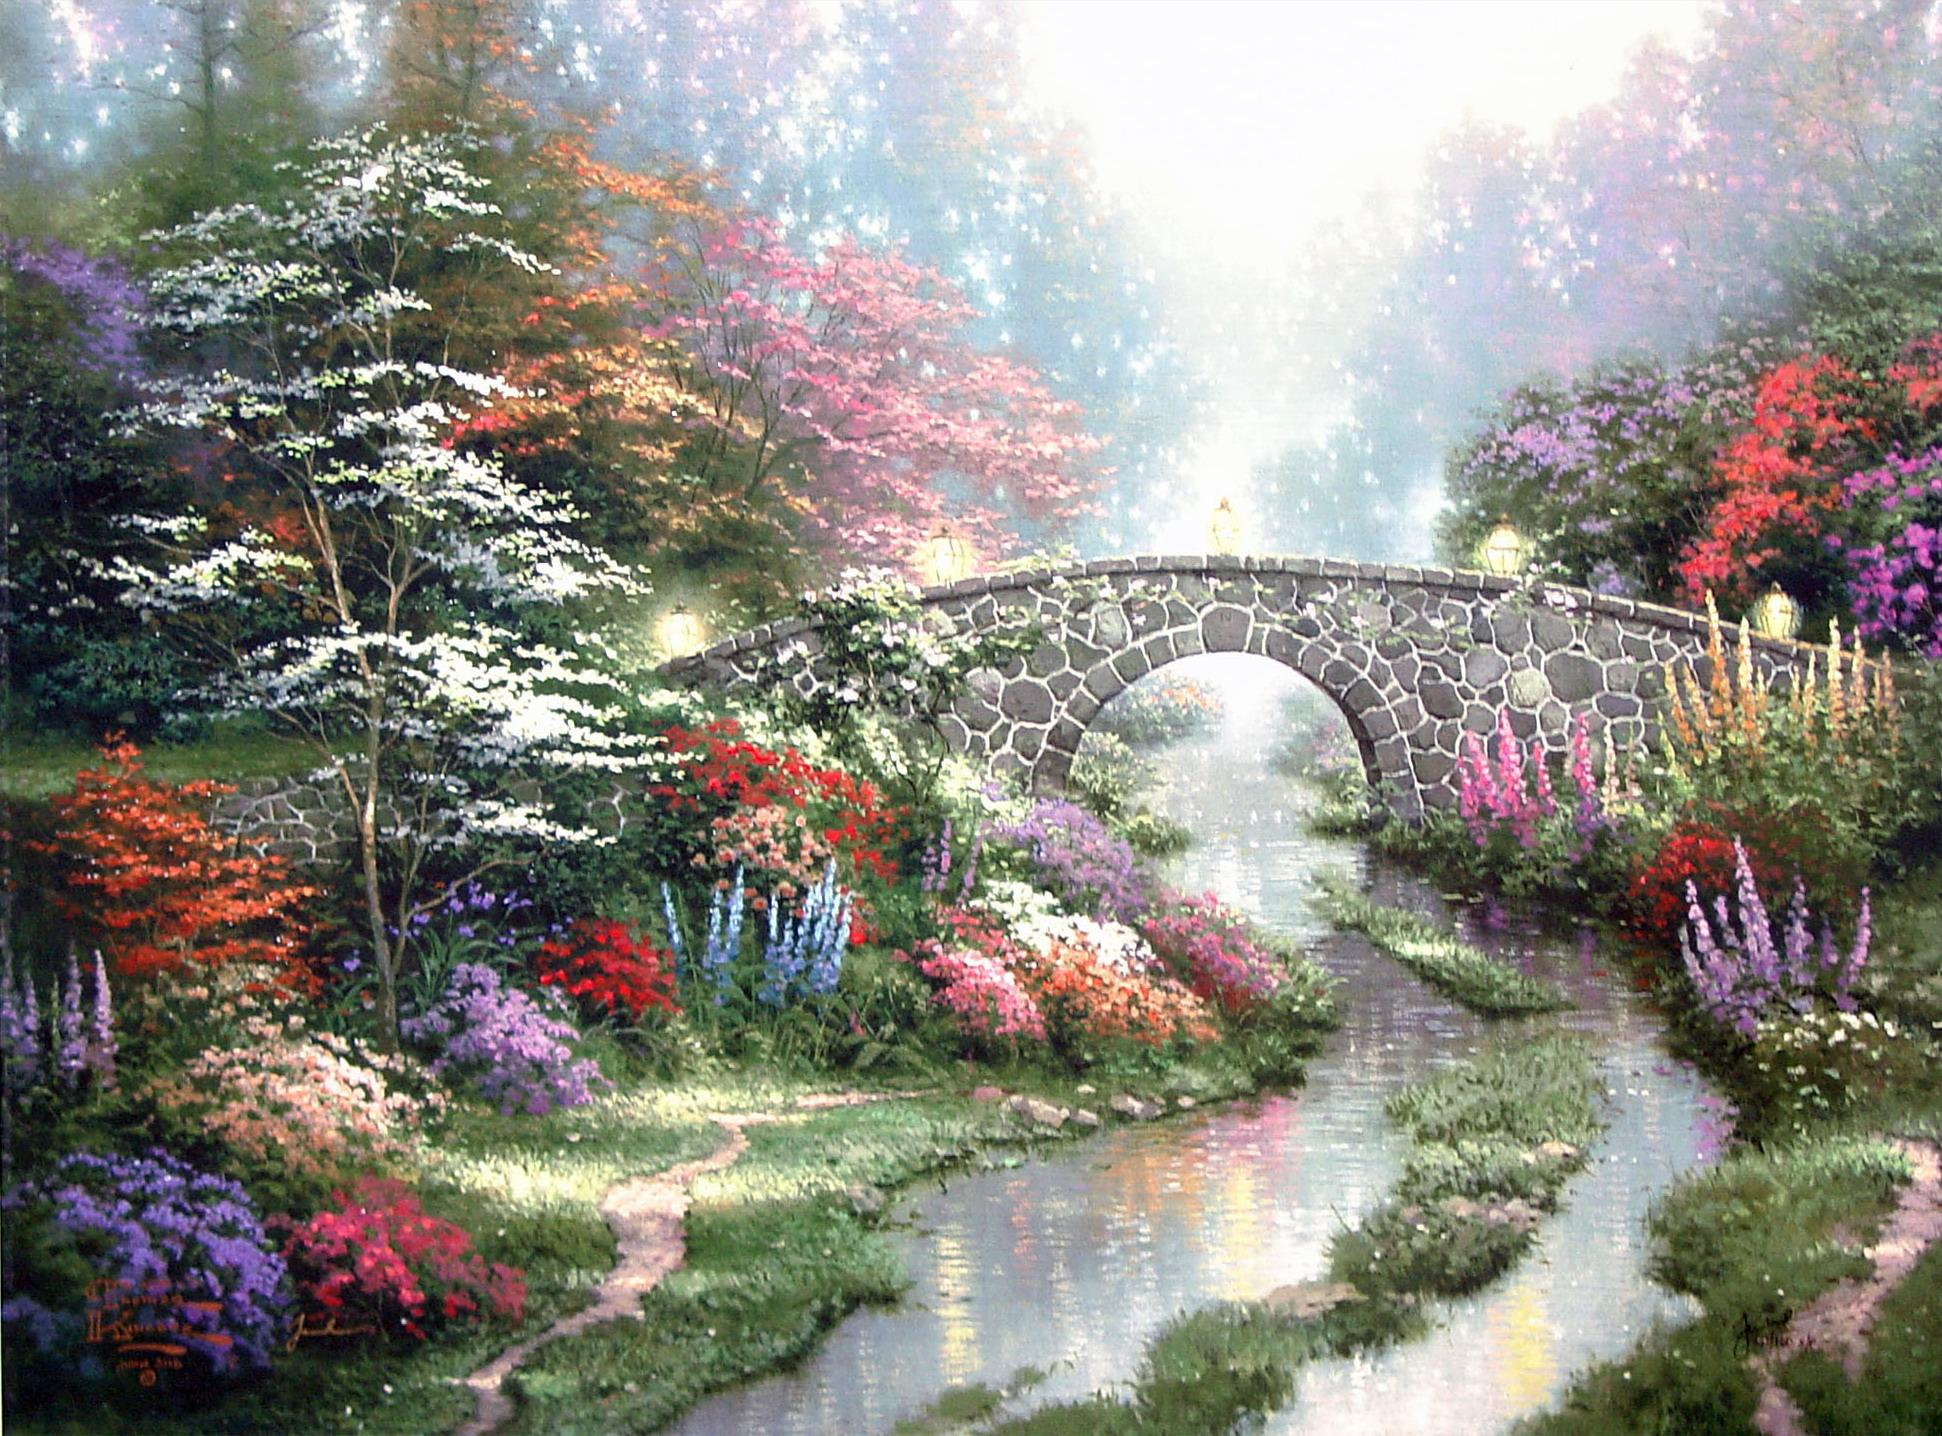 Galaxy S4 Fall Wallpaper By Thomas Kinkade Wallpaper Nature And Landscape